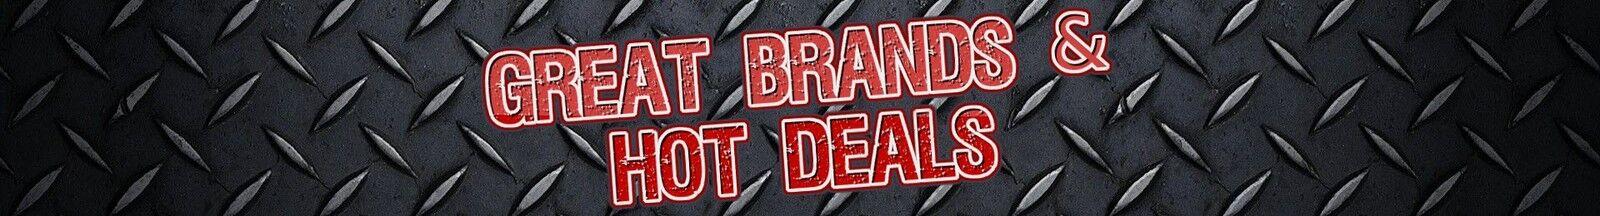 Great Brands & Hot Deals